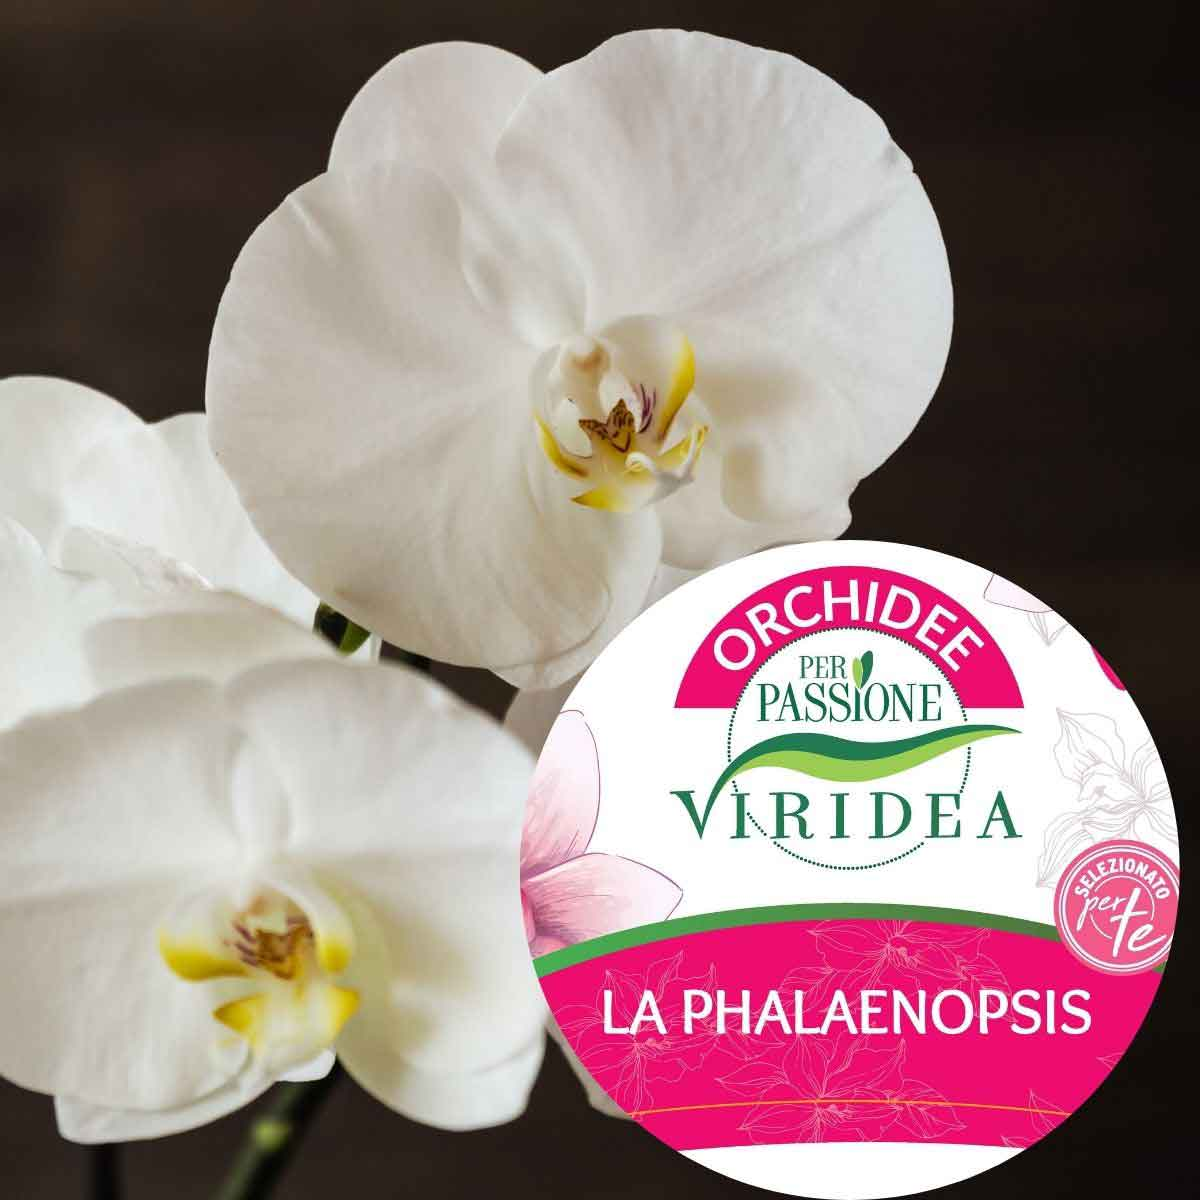 Per Passione – Orchidea Phalaenopsis extra a tre rami